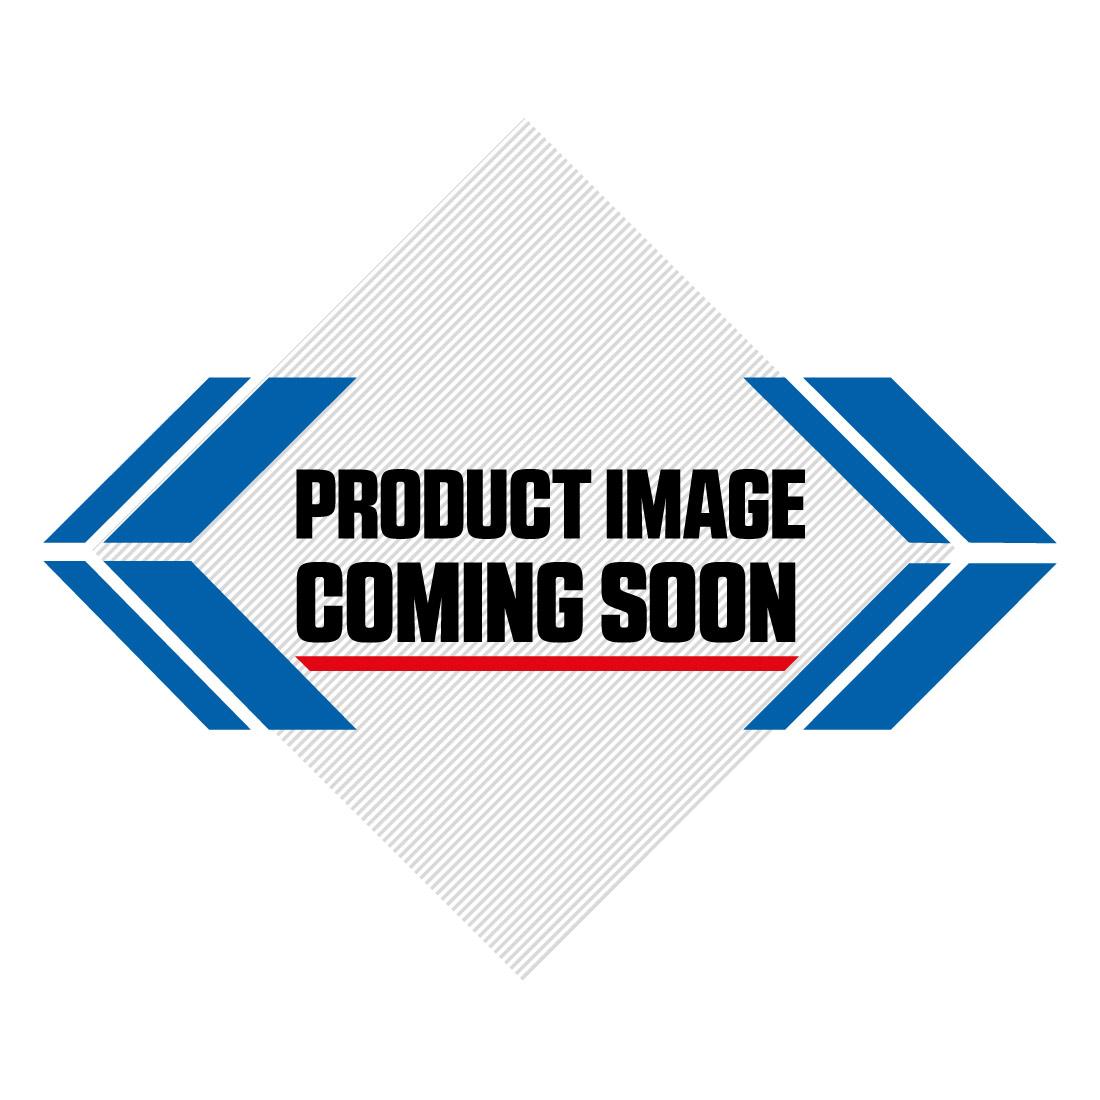 Sidi Crossfire 3 SRS Motocross Boots - TC222 Cairoli LTD Edition Image-4